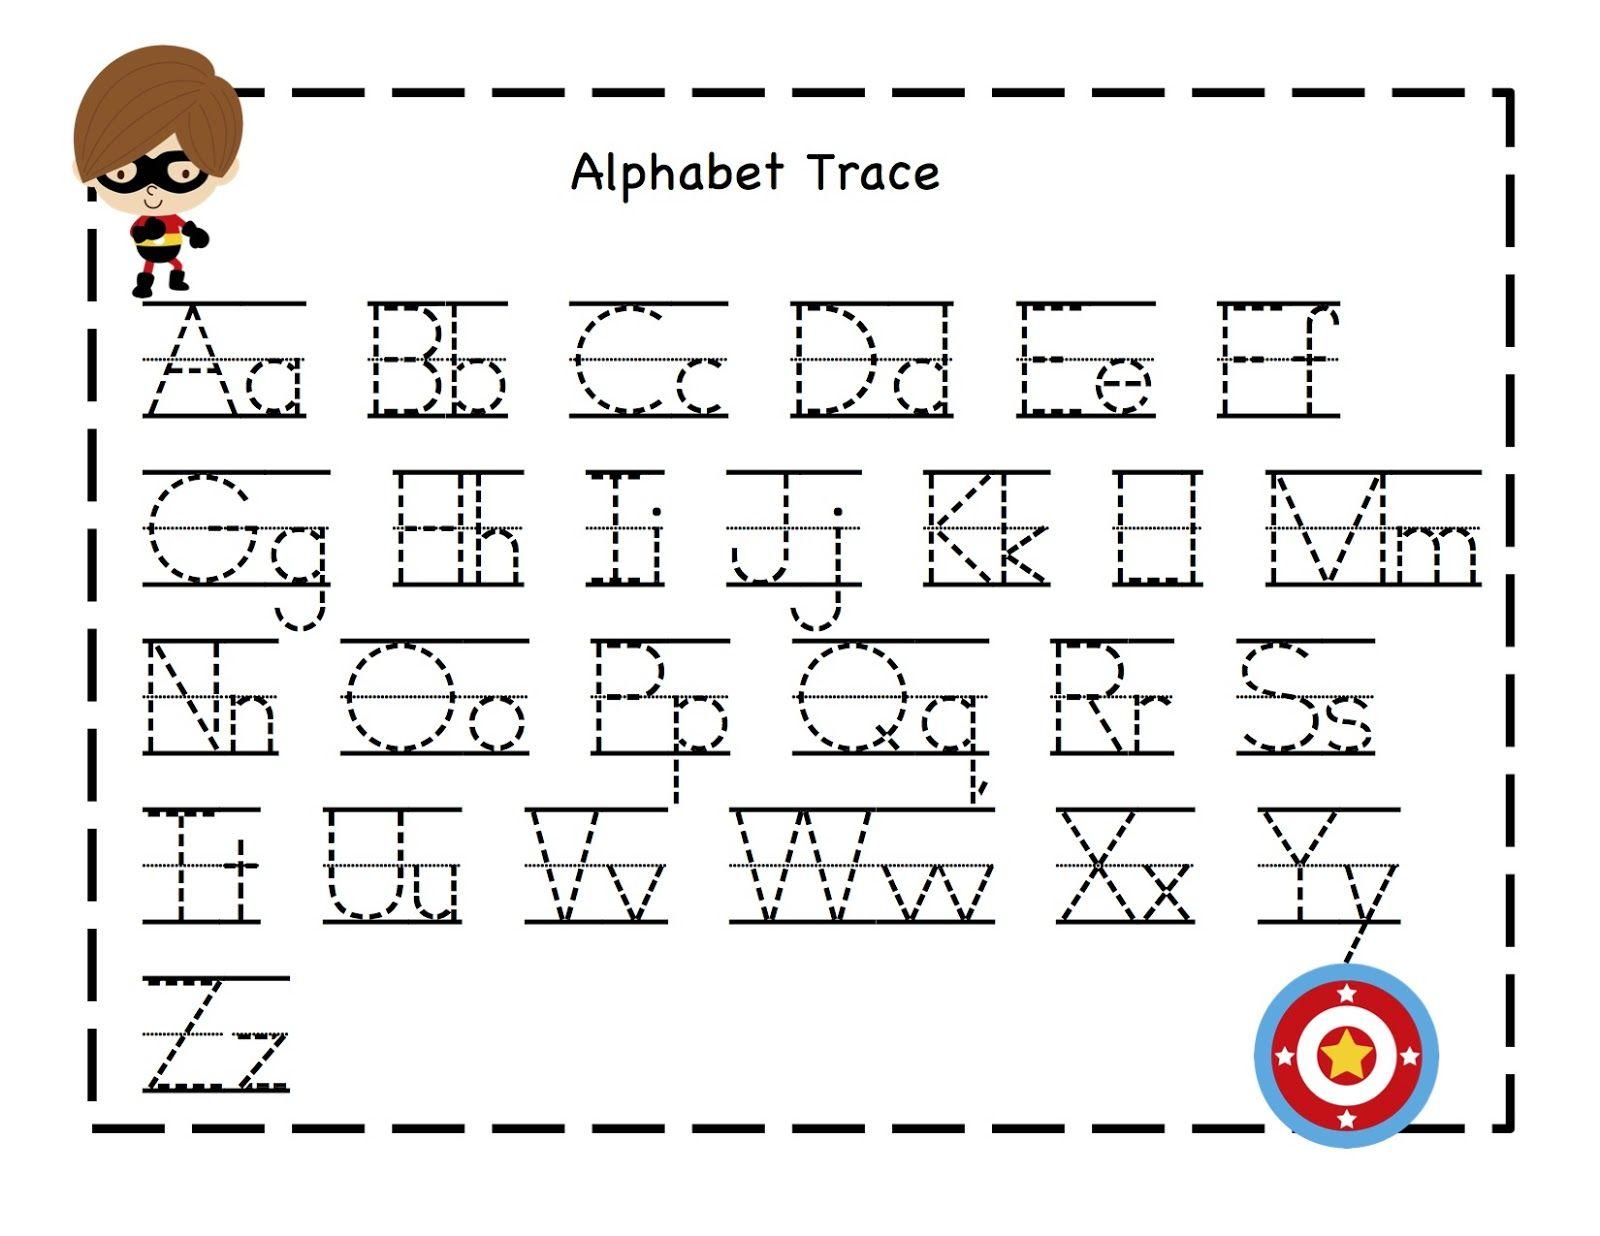 medium resolution of ABC Tracing Sheets for Preschool Kids   Alphabet preschool